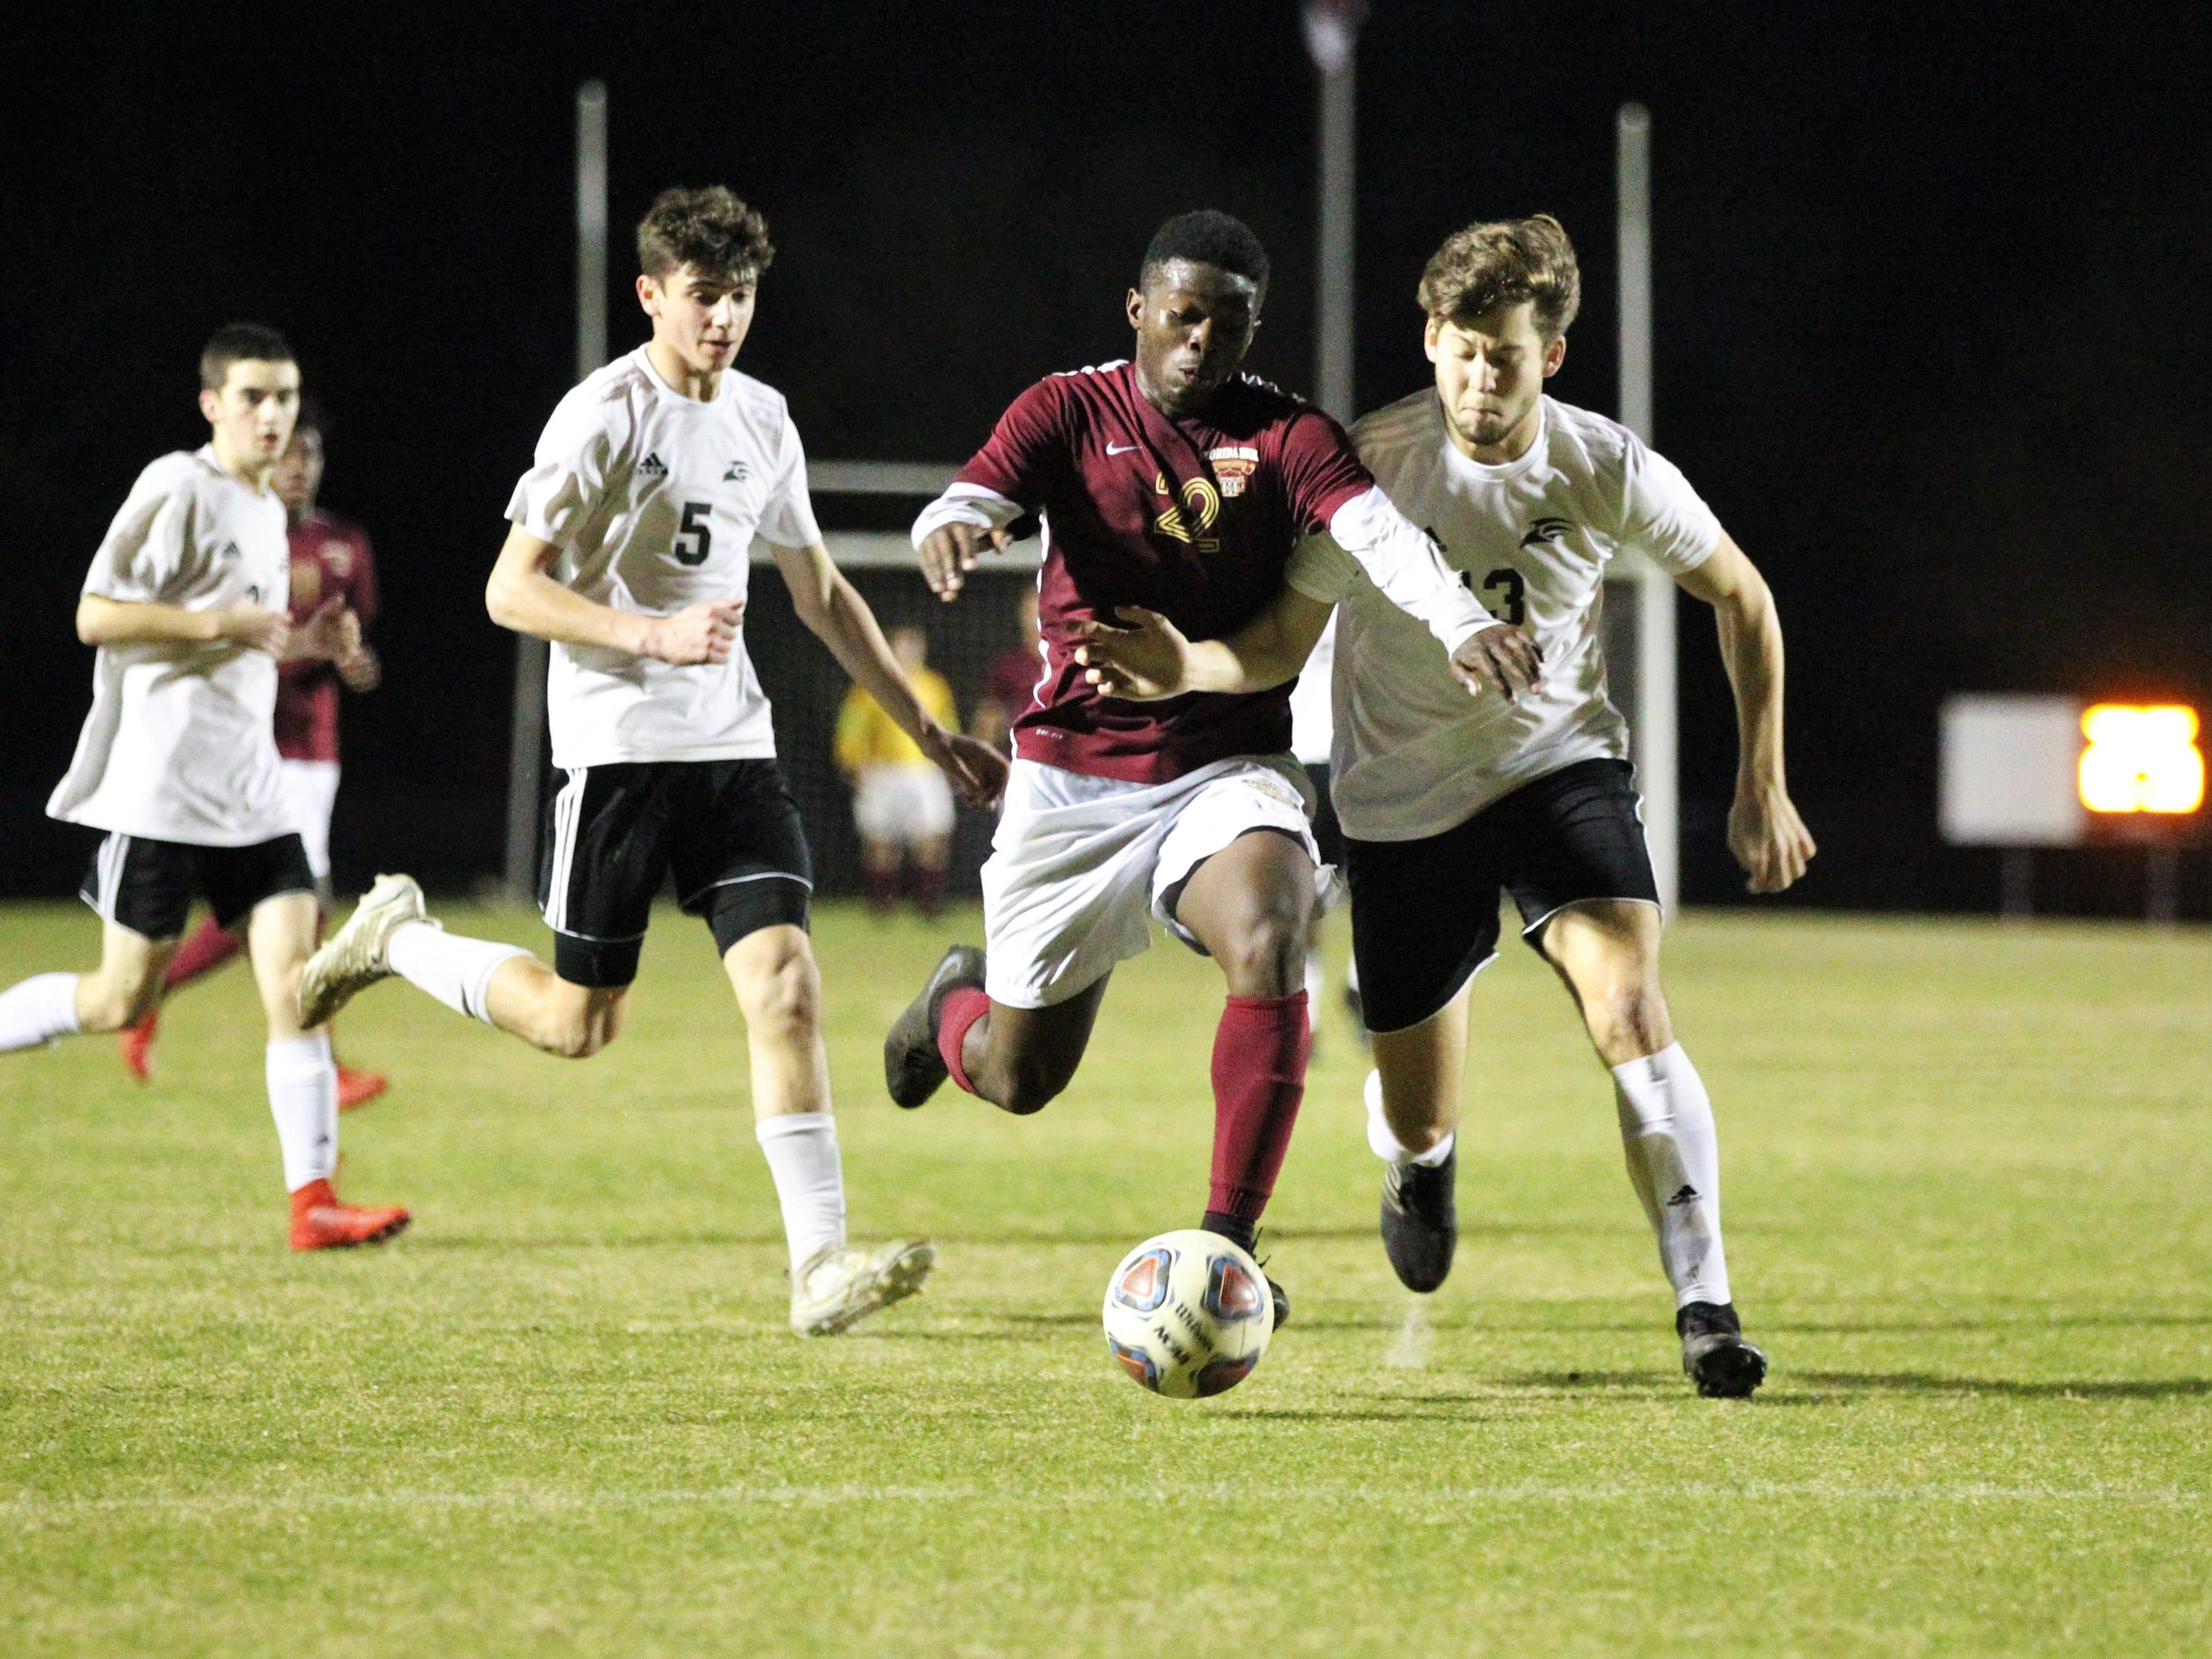 Florida High's Delali Simpson fights for a through ball as Florida High's boys soccer team beat South Walton 2-0 during a Region 1-2A quarterfinal on Feb. 6, 2018.